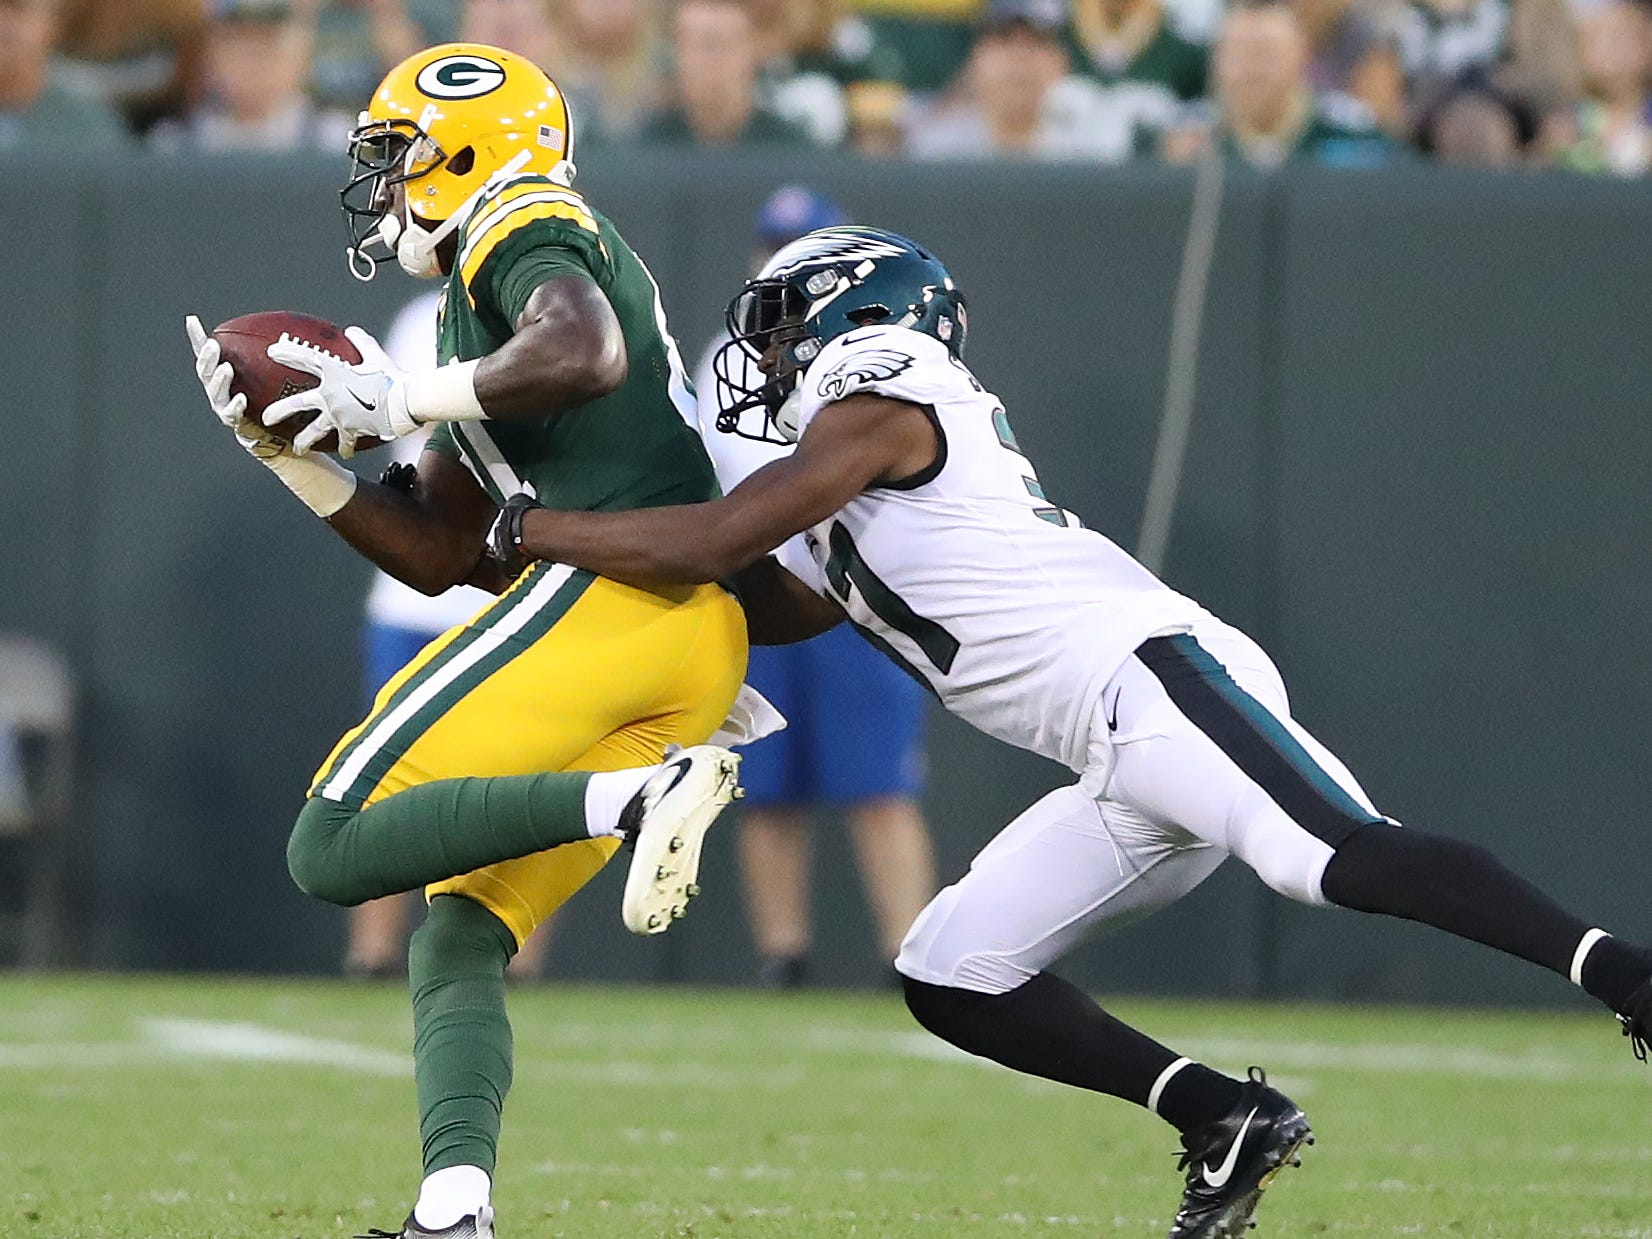 Week 4: Eagles at Packers, 7:20 p.m. CT Thursday, Sept. 26, Lambeau Field (Fox/NFL Network)